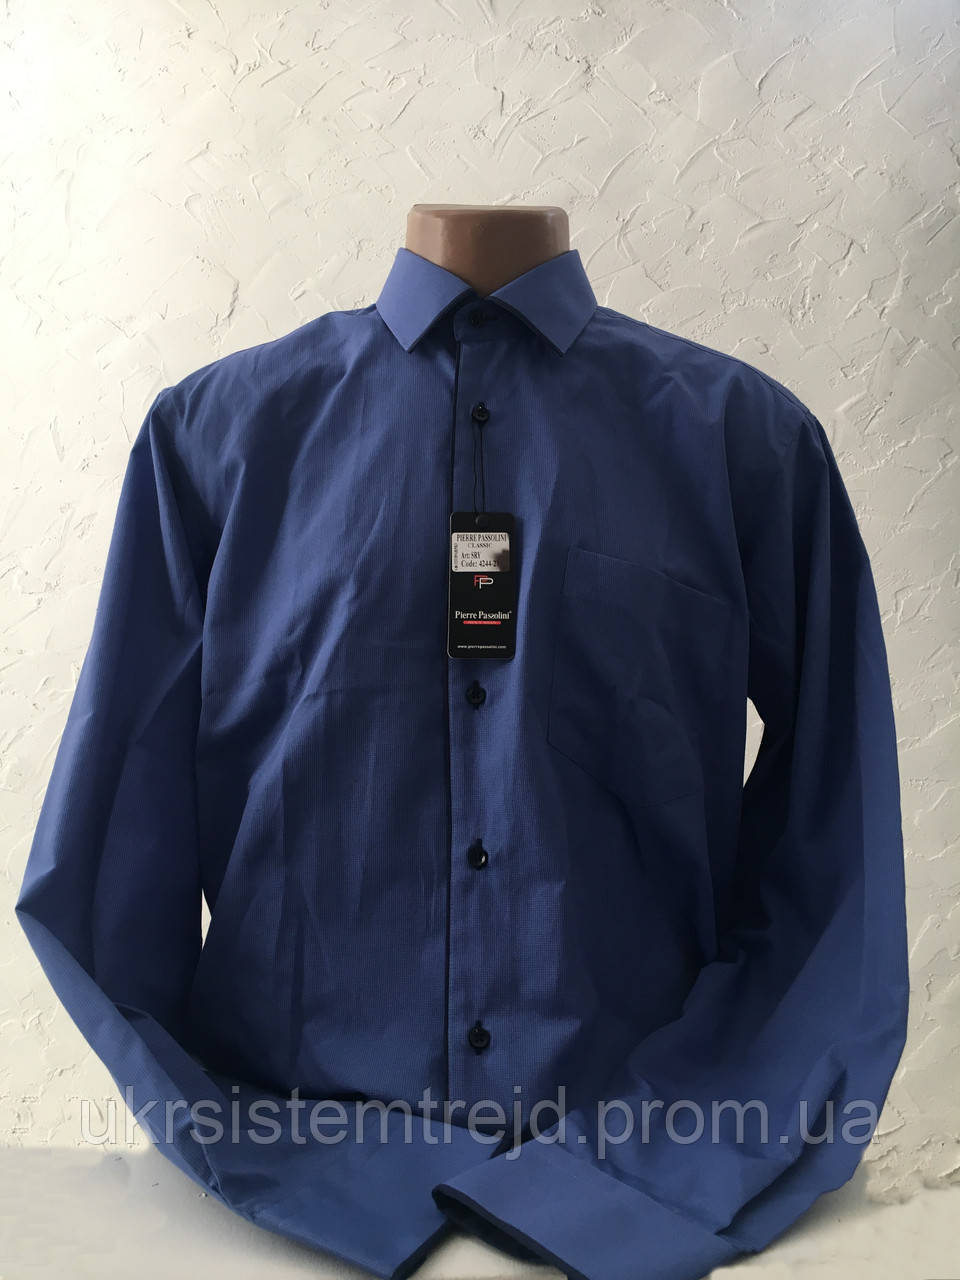 Рубашка мужская  PIERRE PASSOLINI мелкая клетка